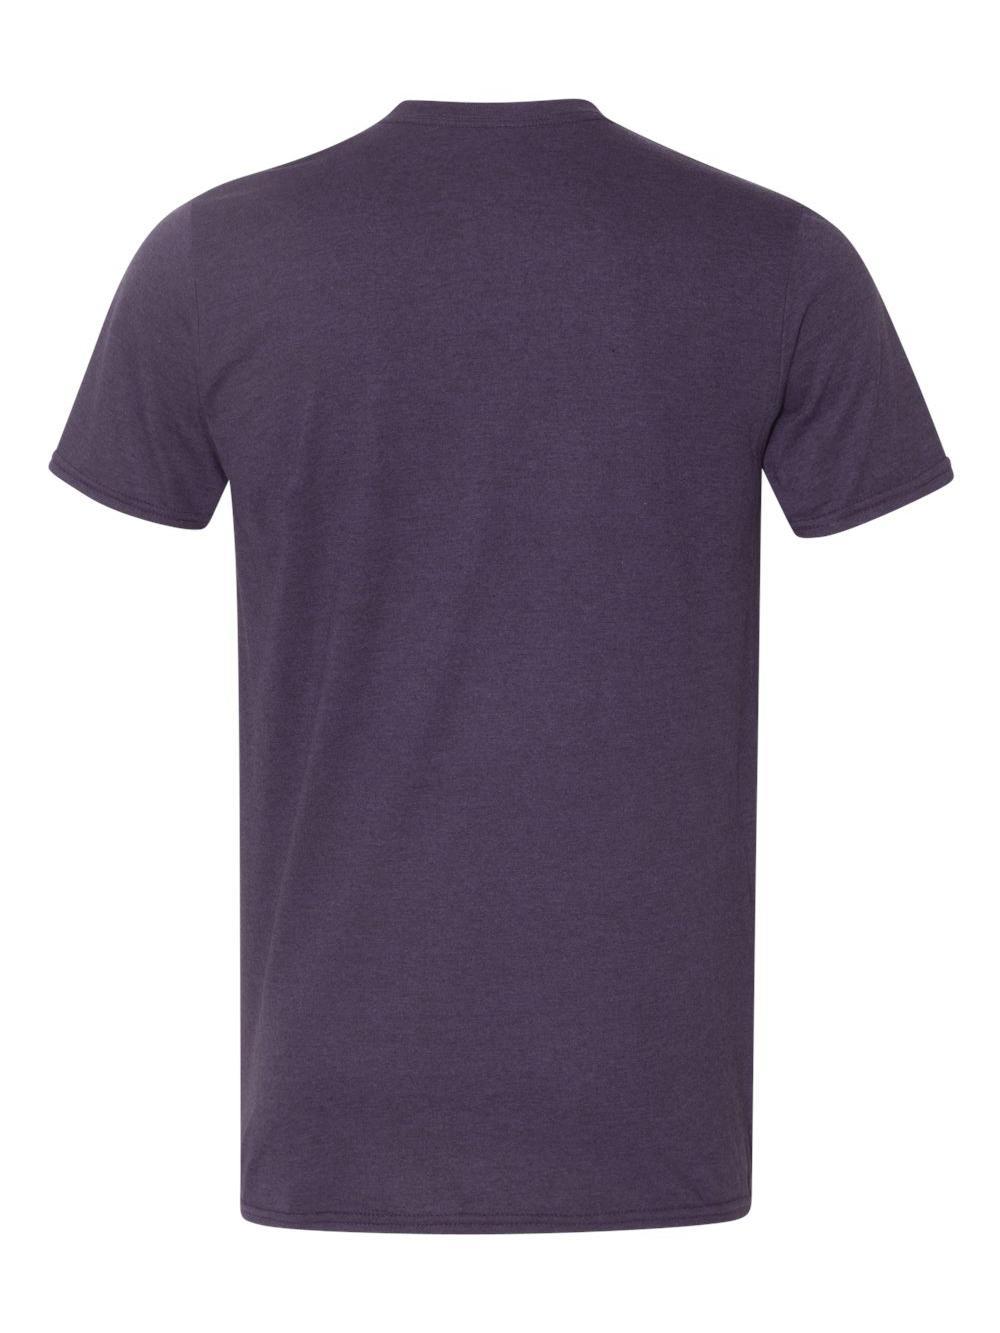 Gildan-Softstyle-T-Shirt-64000 thumbnail 22